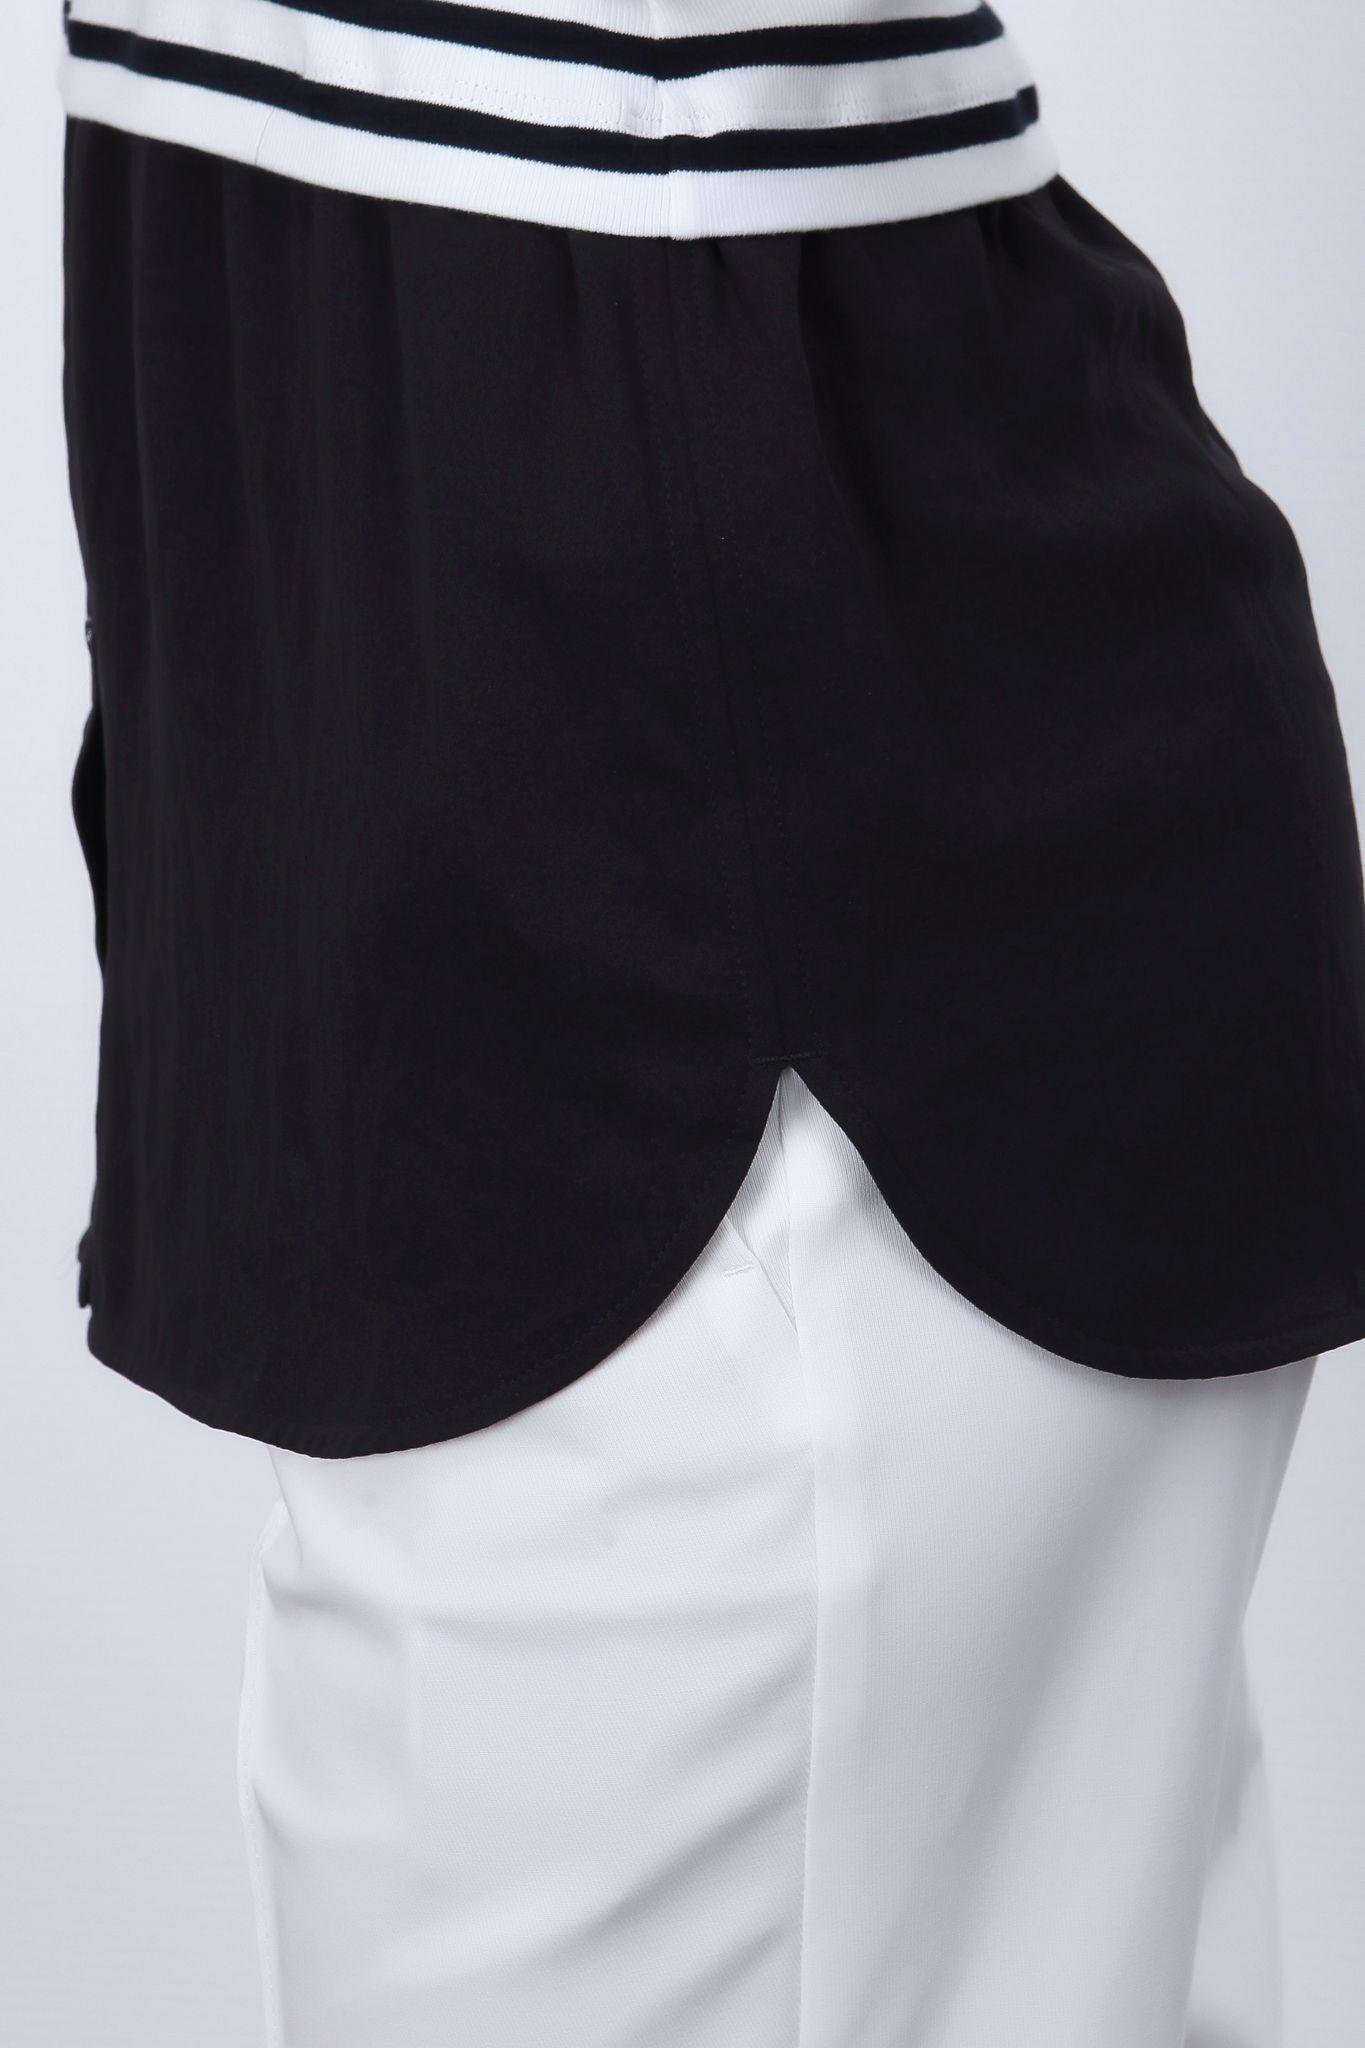 Marc Cain  Sports Топ с имитацией нижней части рубашки